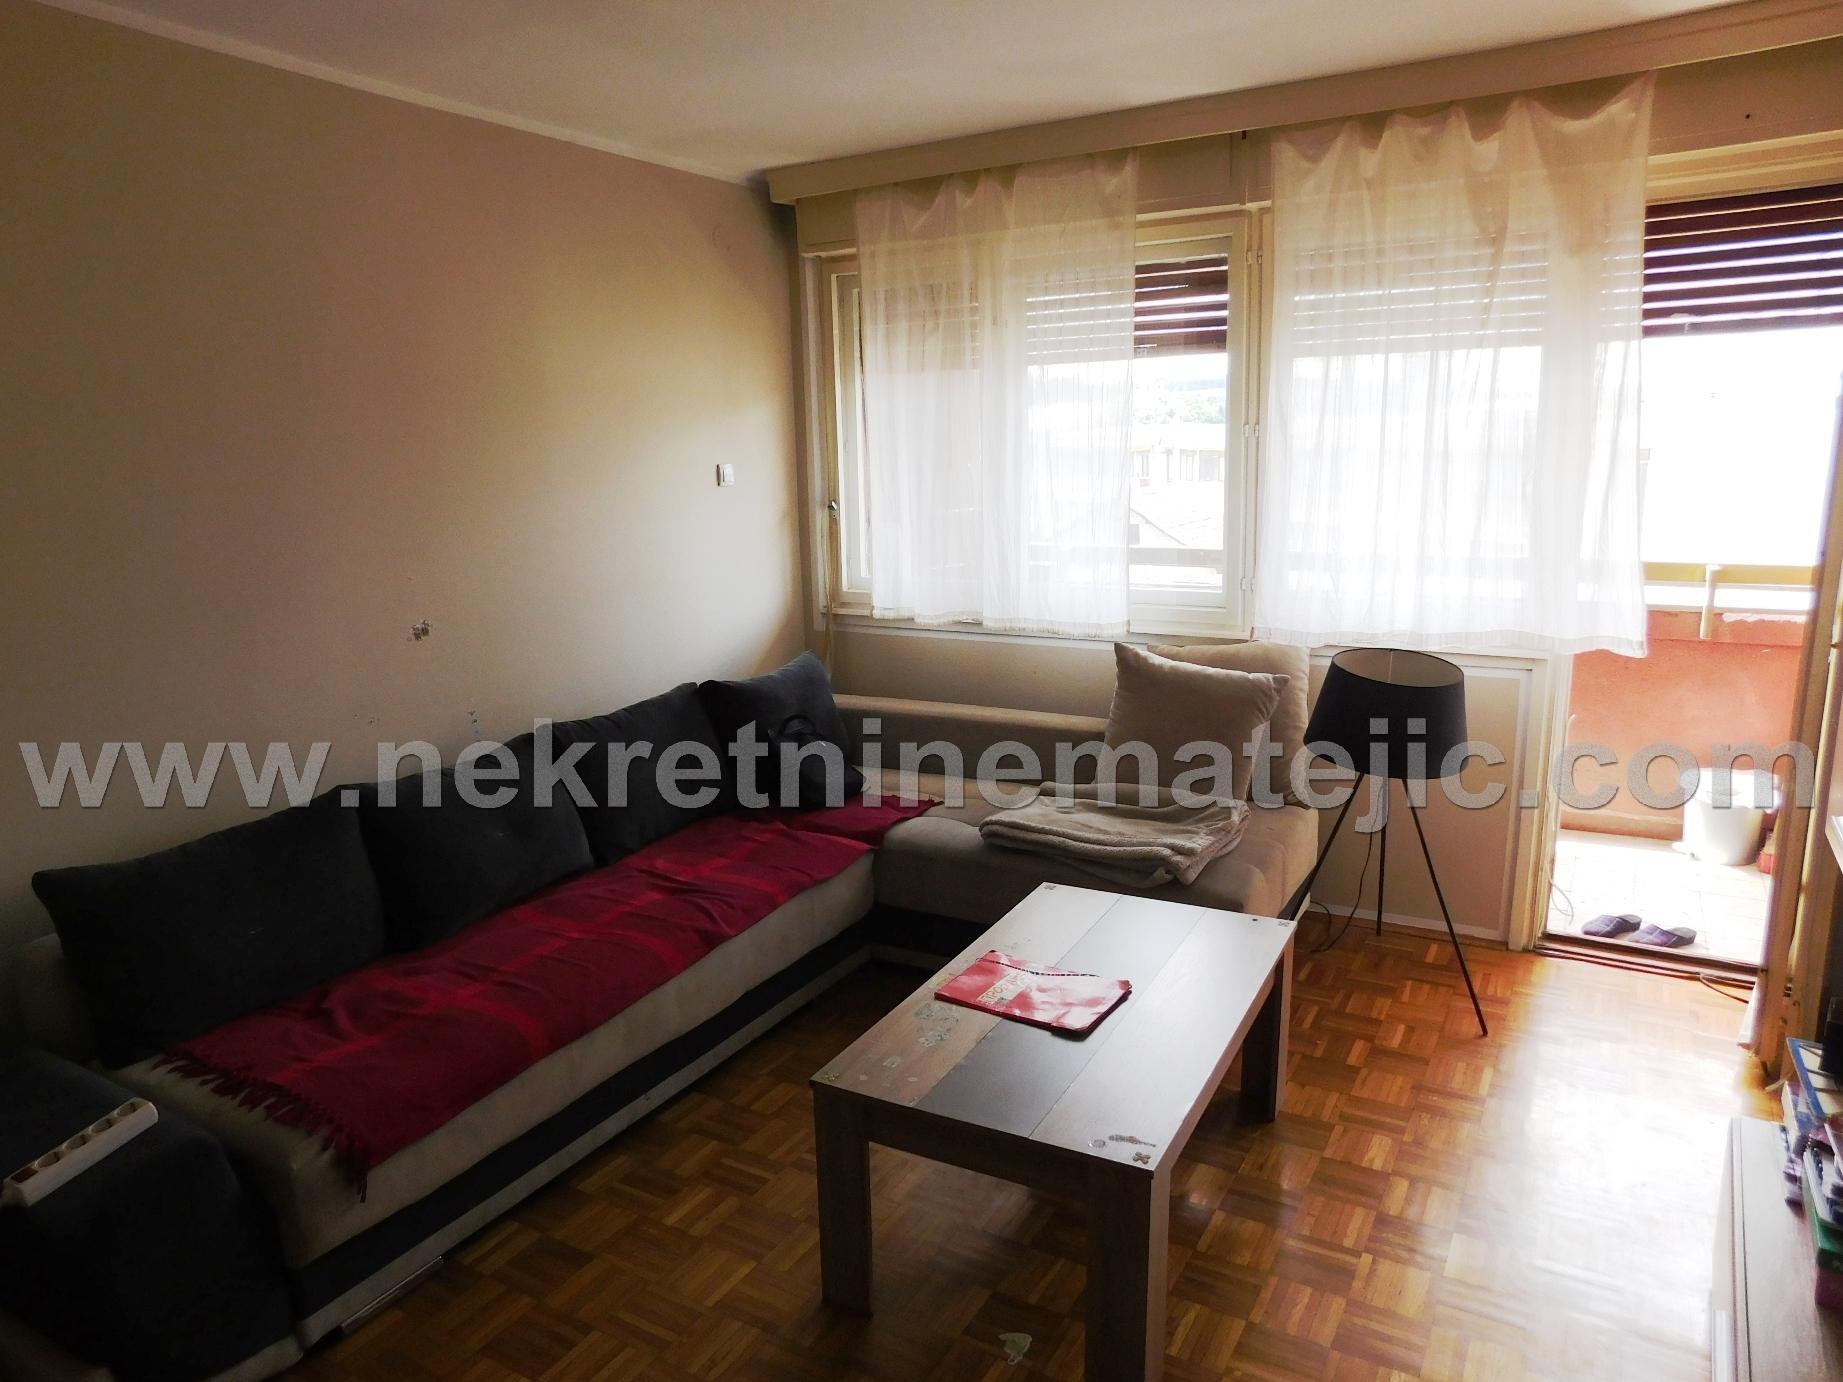 Stan u centru, 53 m2, 2.0, u dobrom stanju, na 3. spratu, cena – 45.000 E